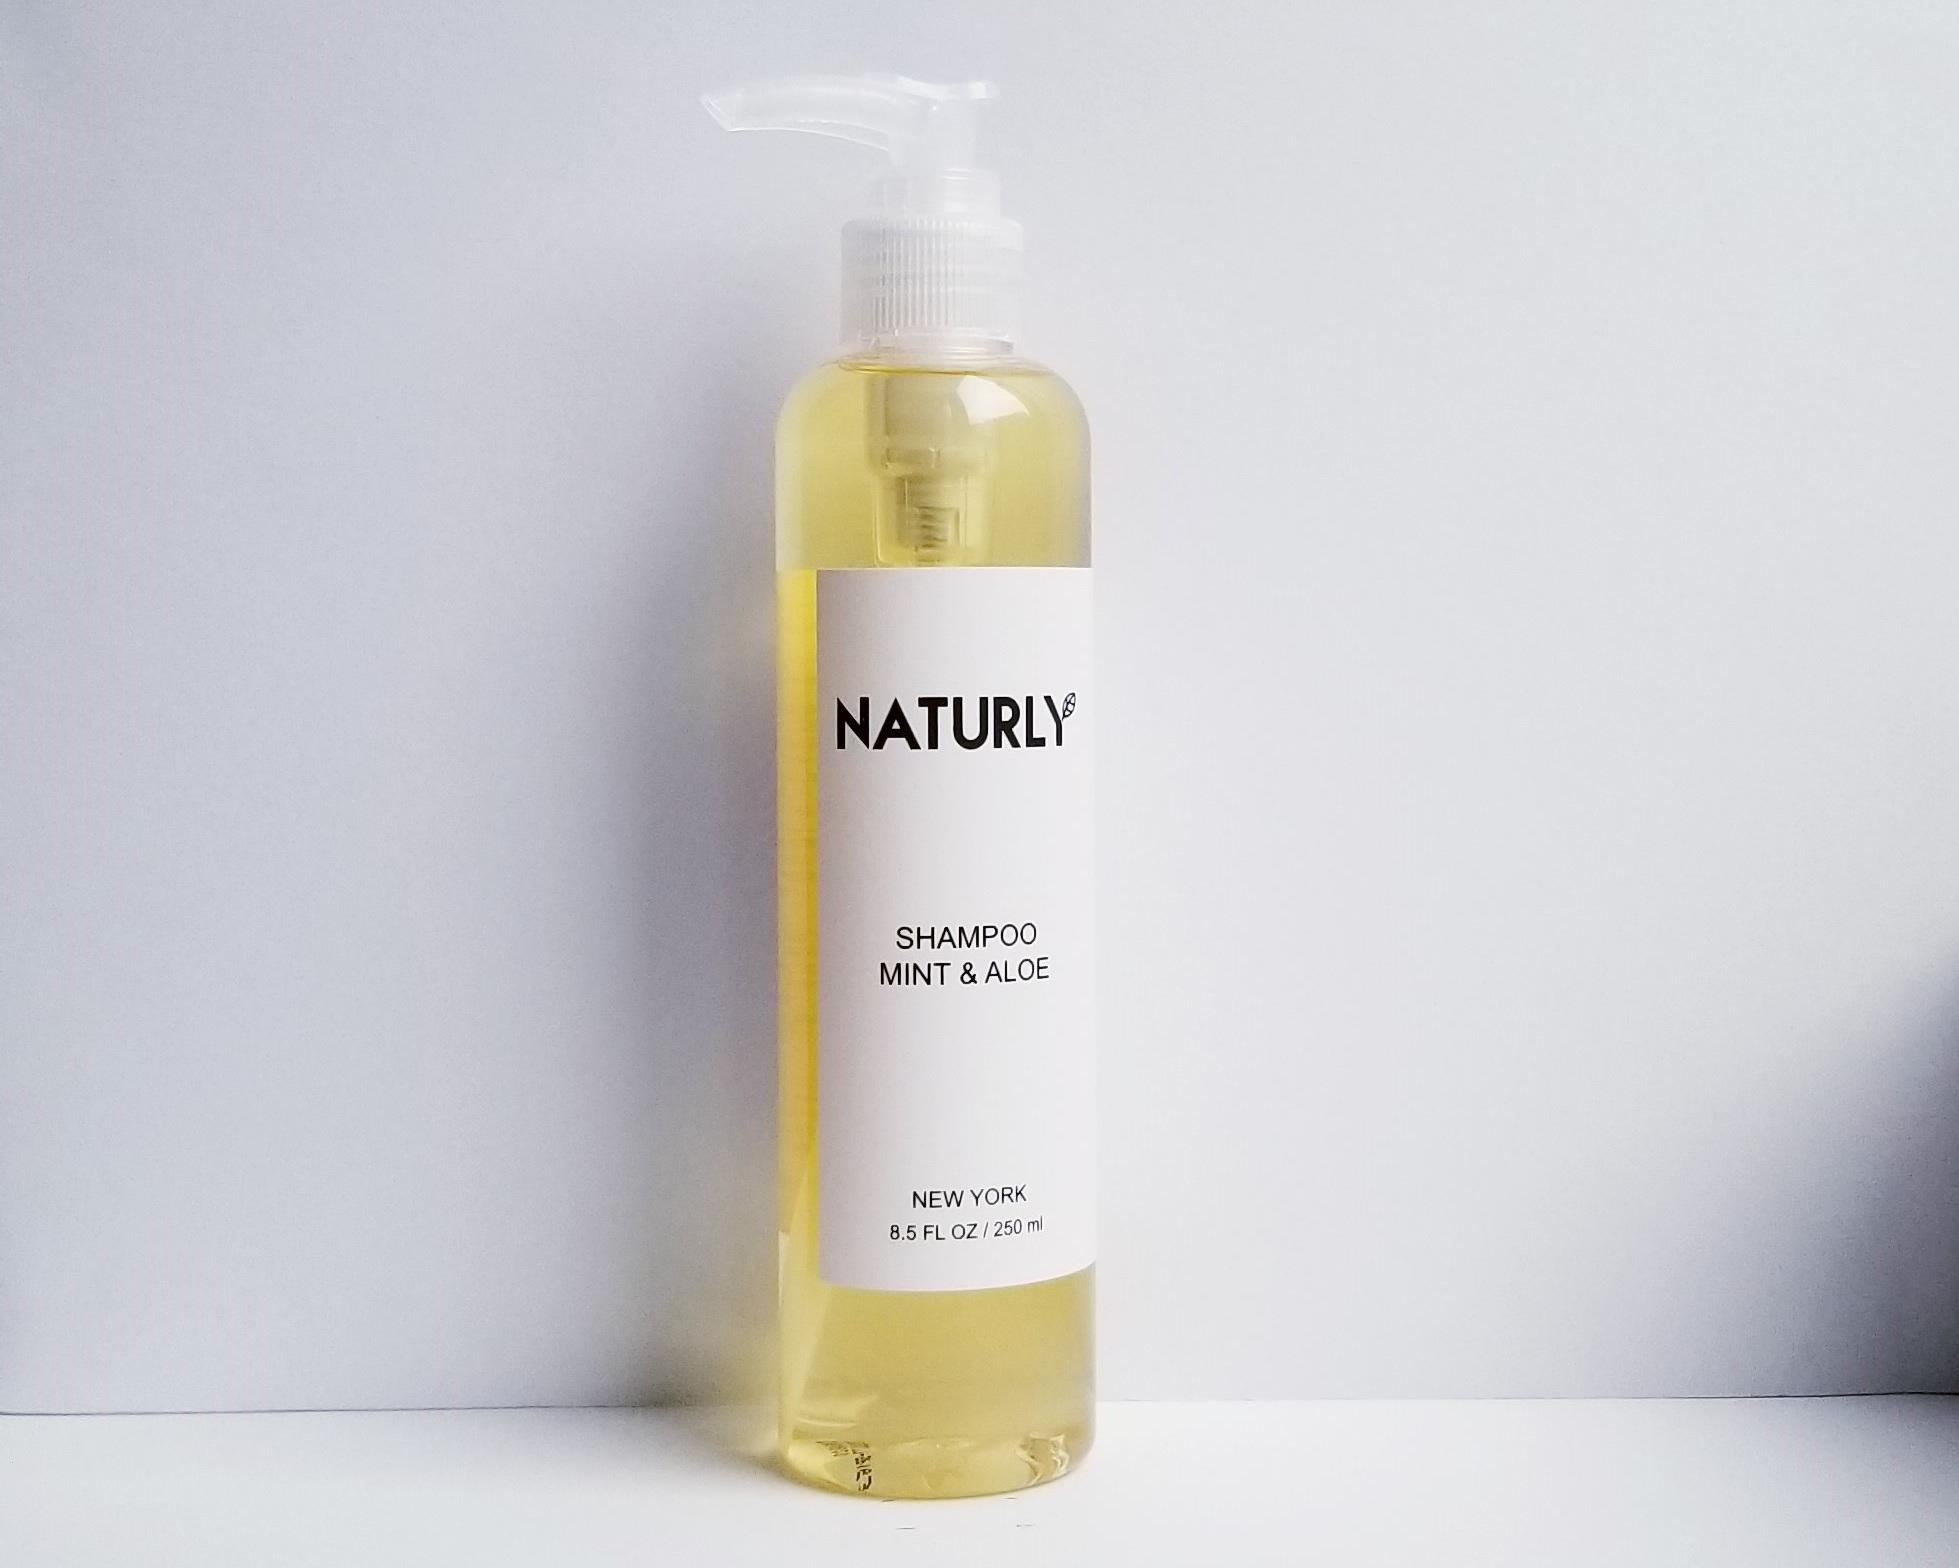 Shampoo with spearmint oil, aloe vera, anti-oxidant vitamin E - $28